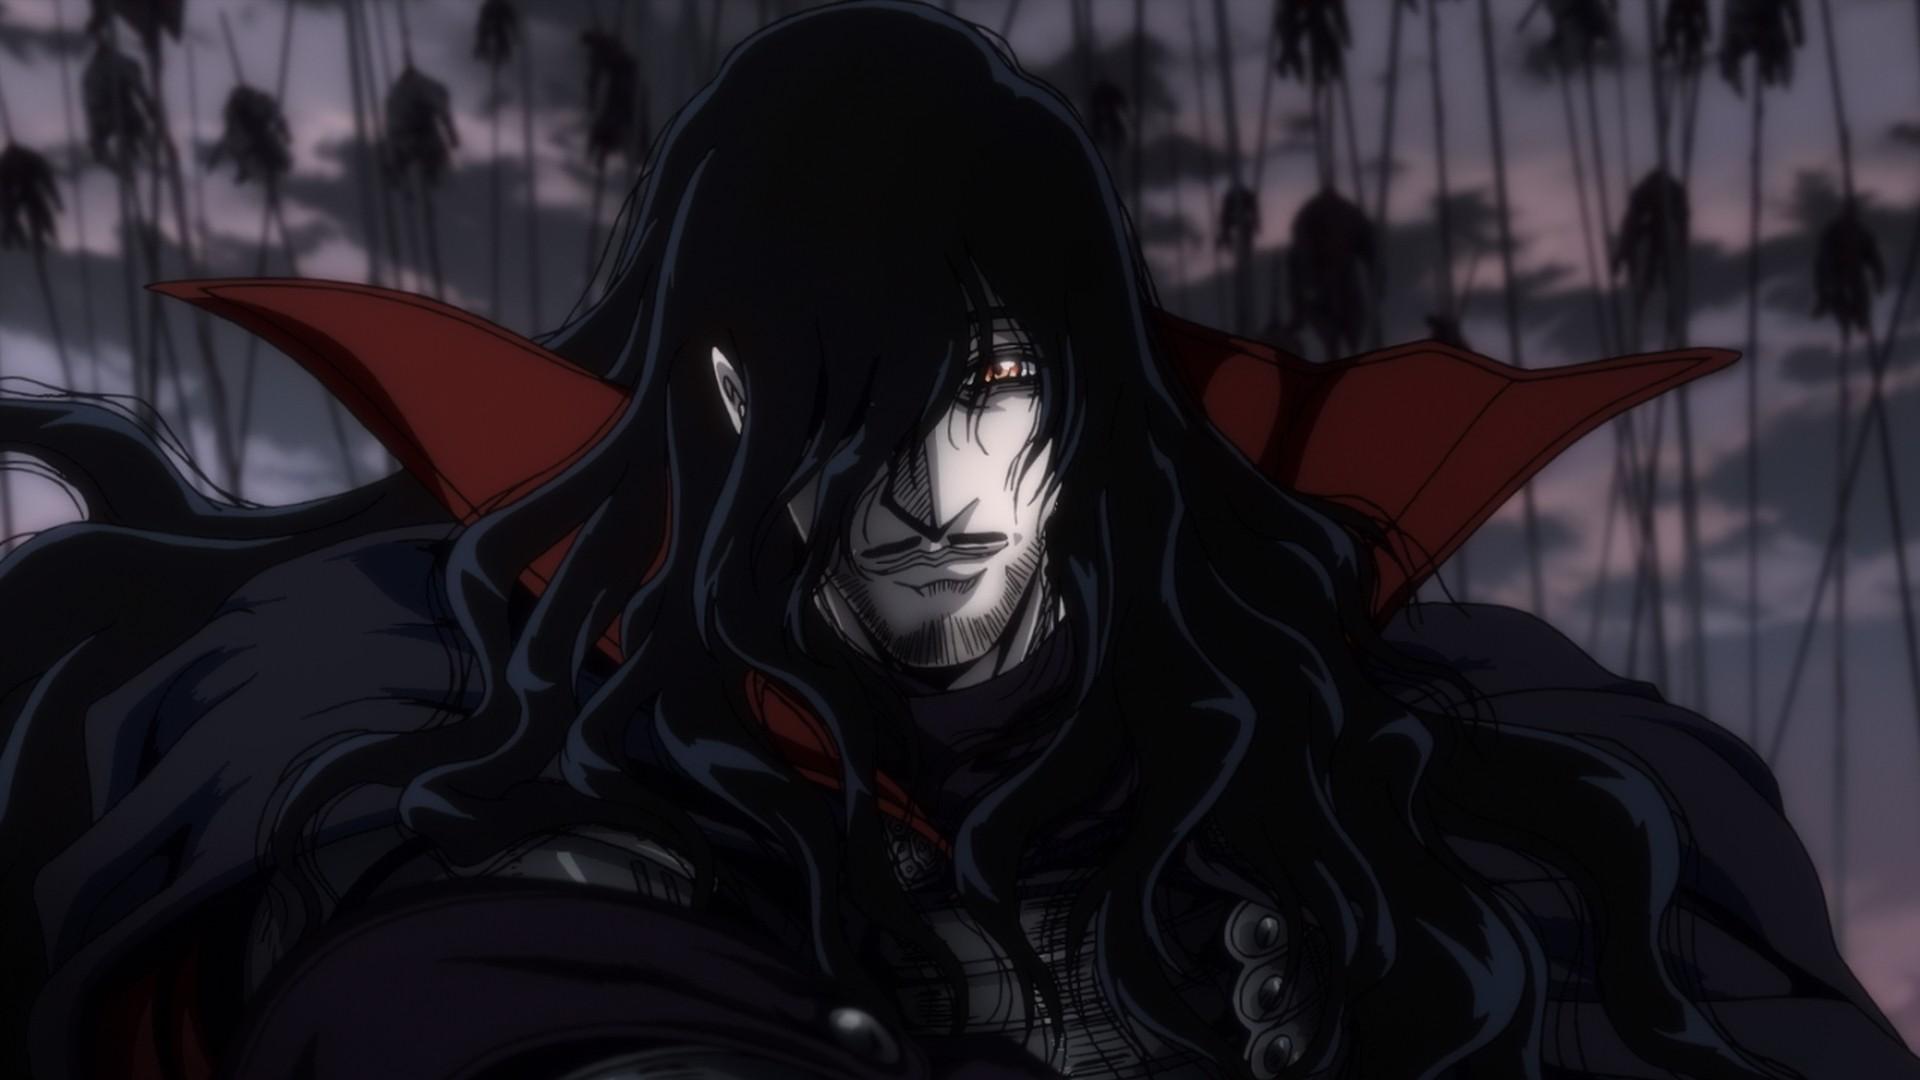 Anime – Hellsing Alucard (Hellsing) Wallpaper